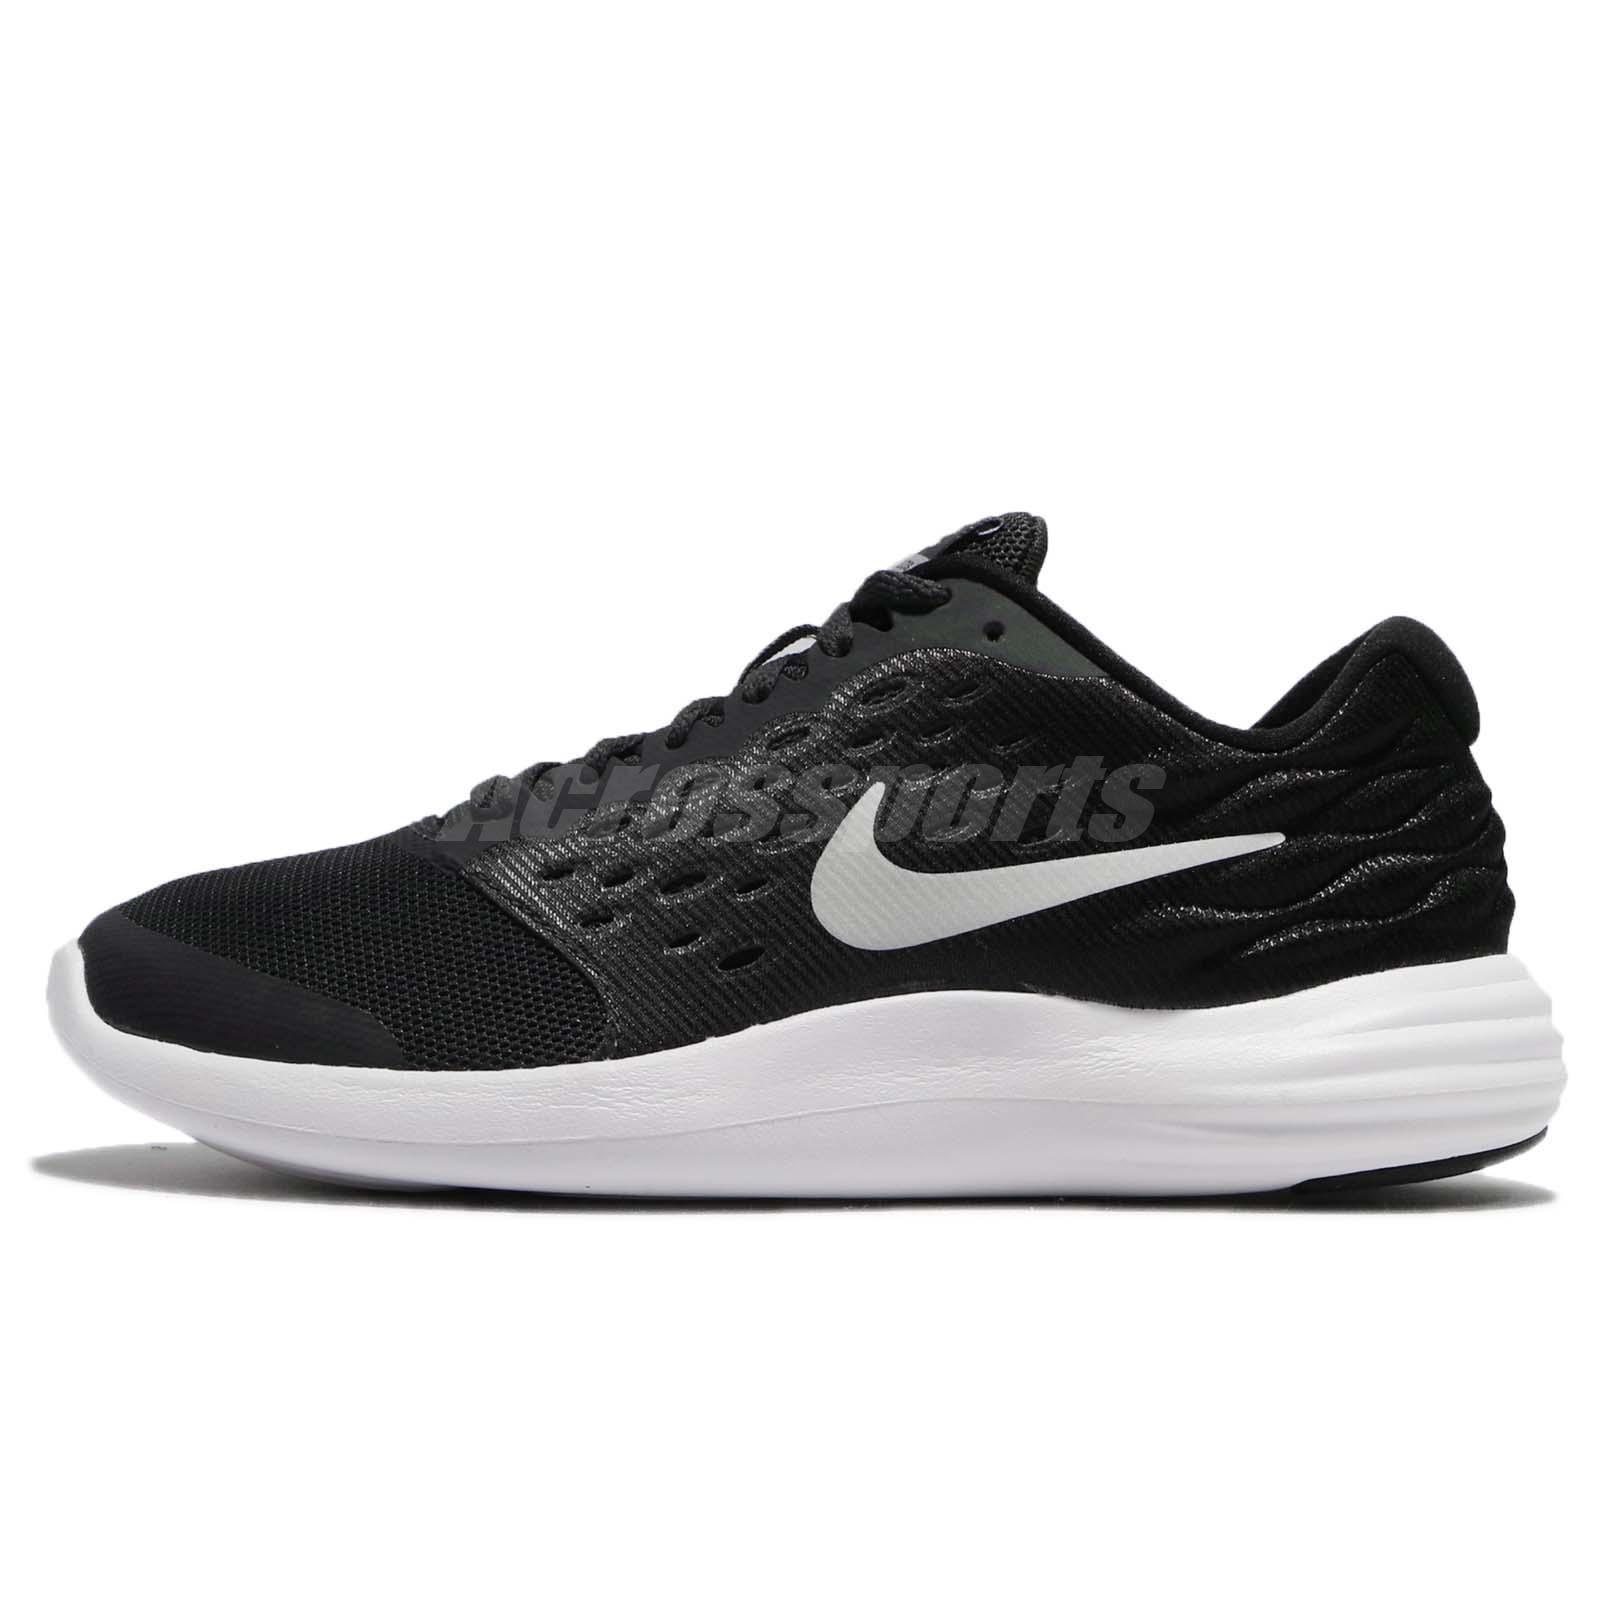 reputable site a6368 cb4ff Nike Lunarstelos GS Anthracite Silver Kids Women Running Shoe Sneaker  844969-001